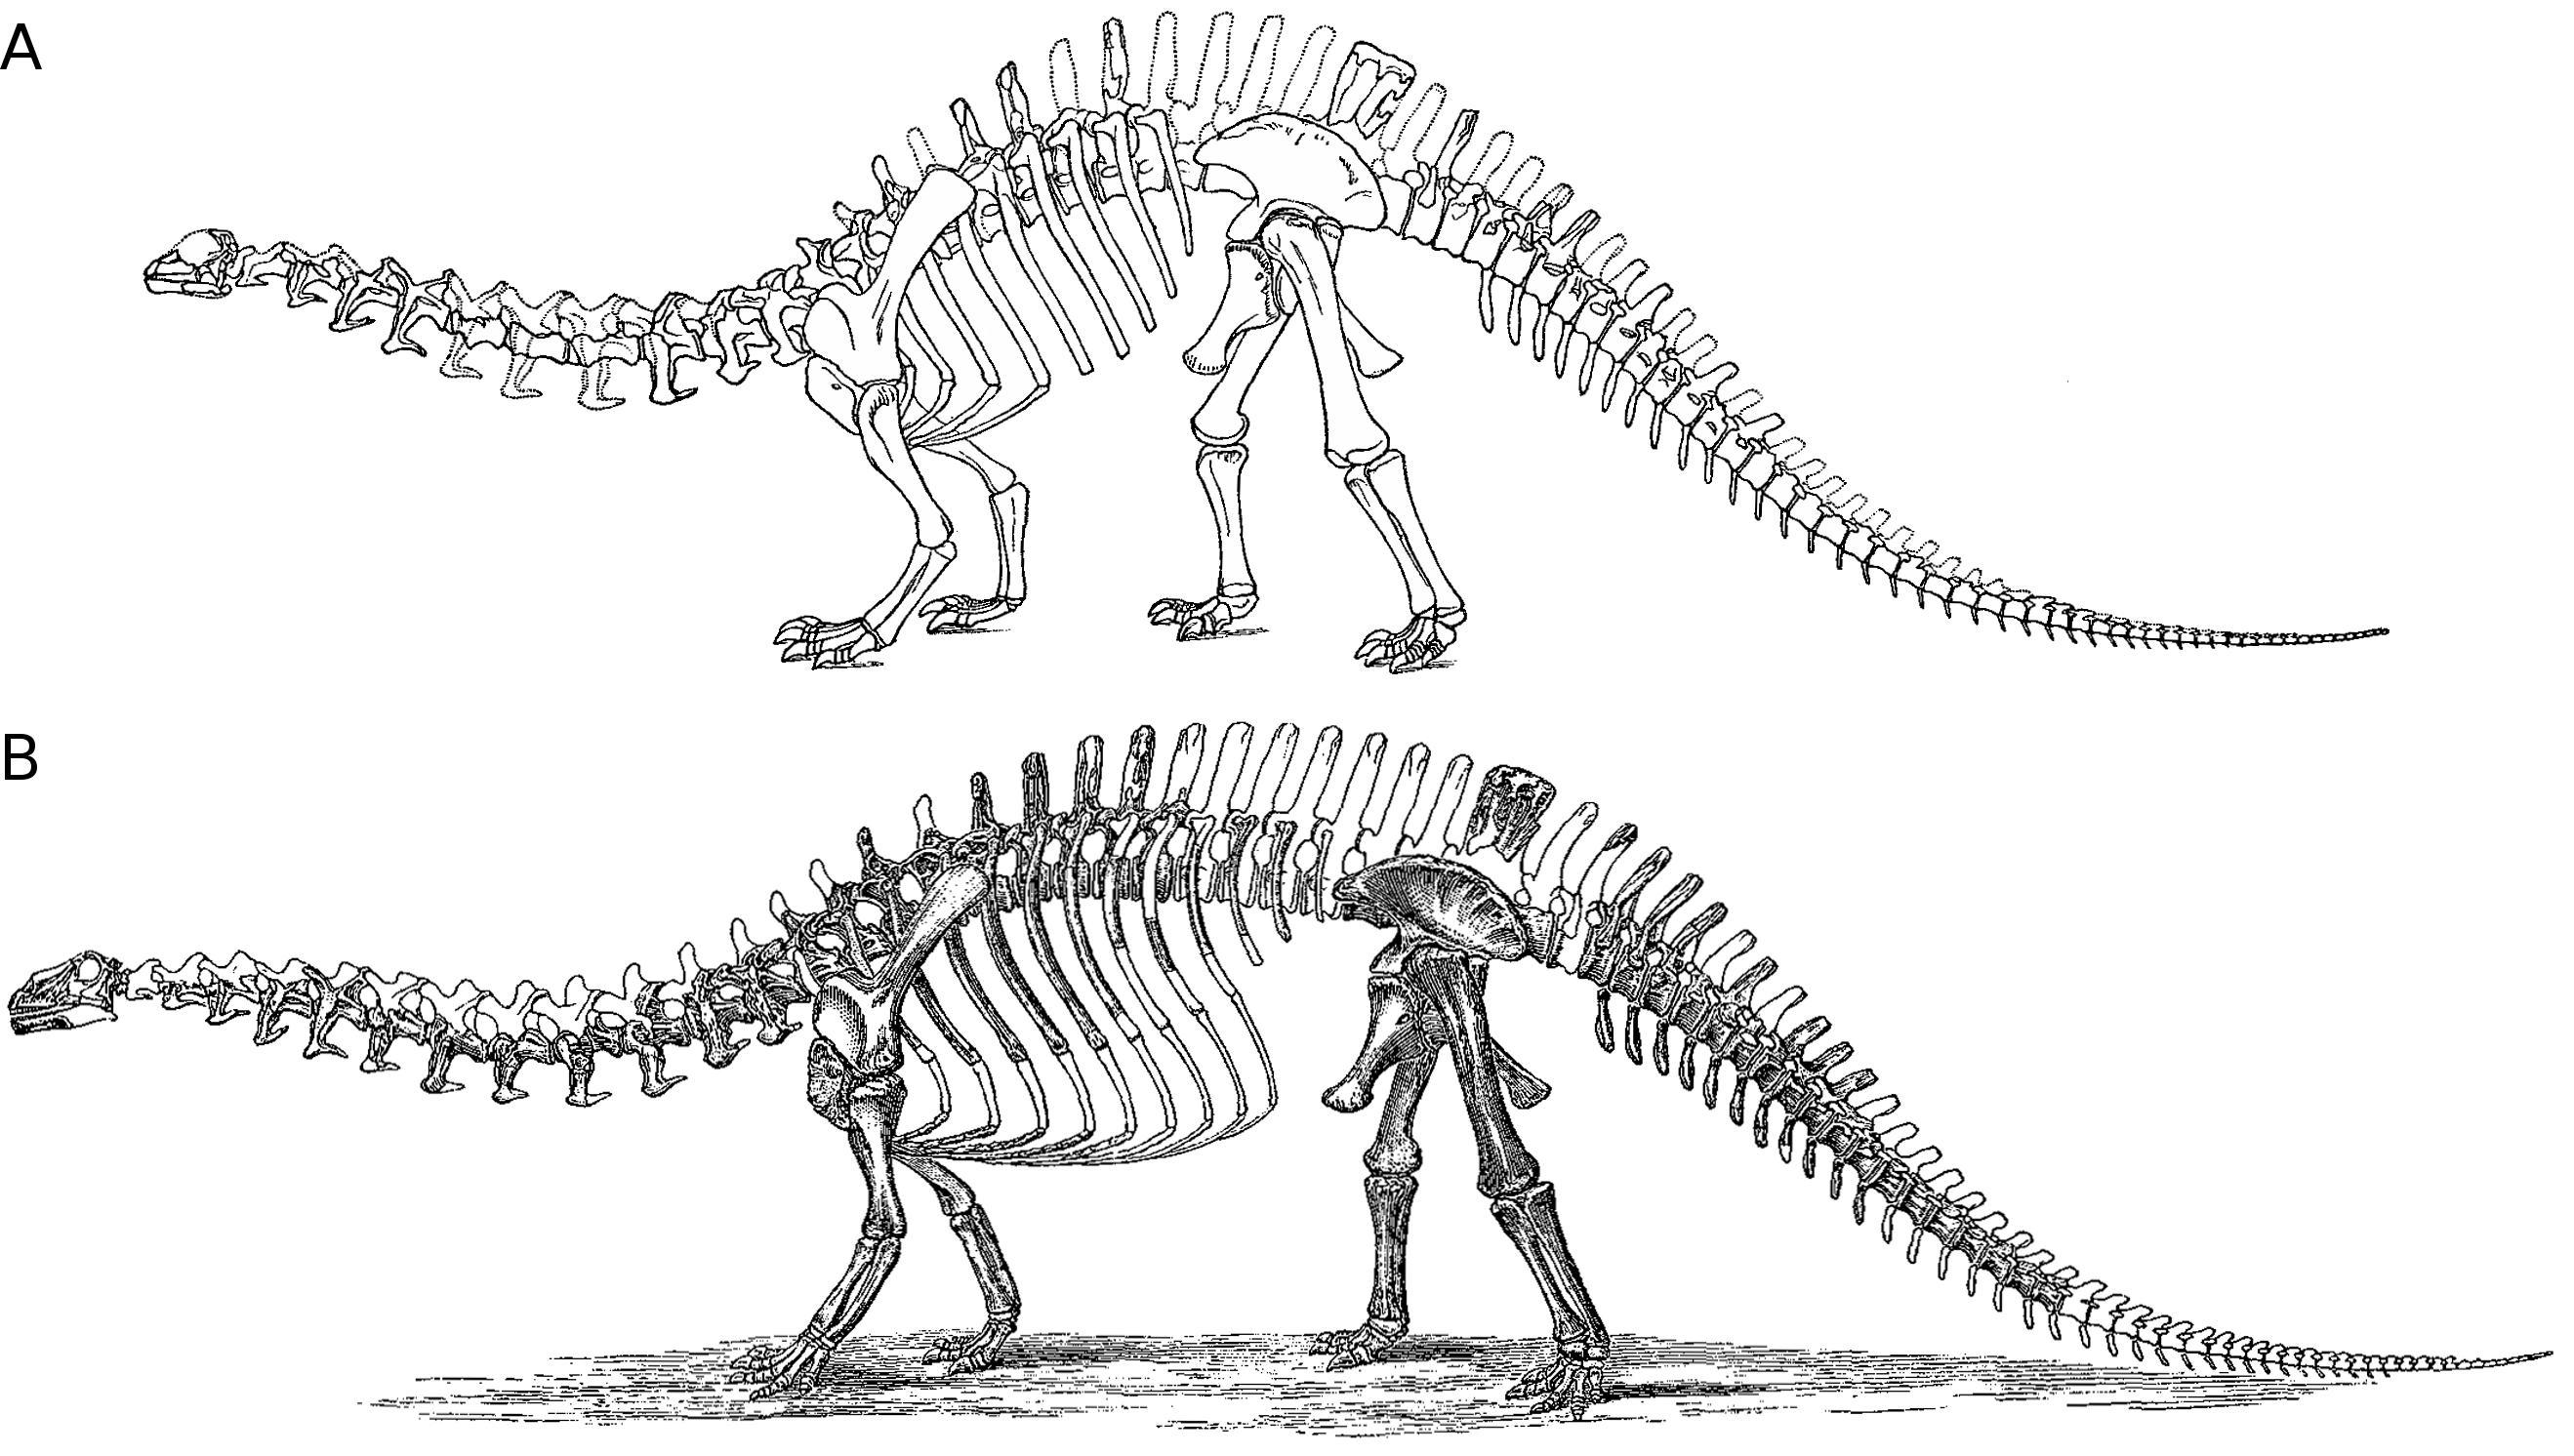 Supplementary Information On Sauropod